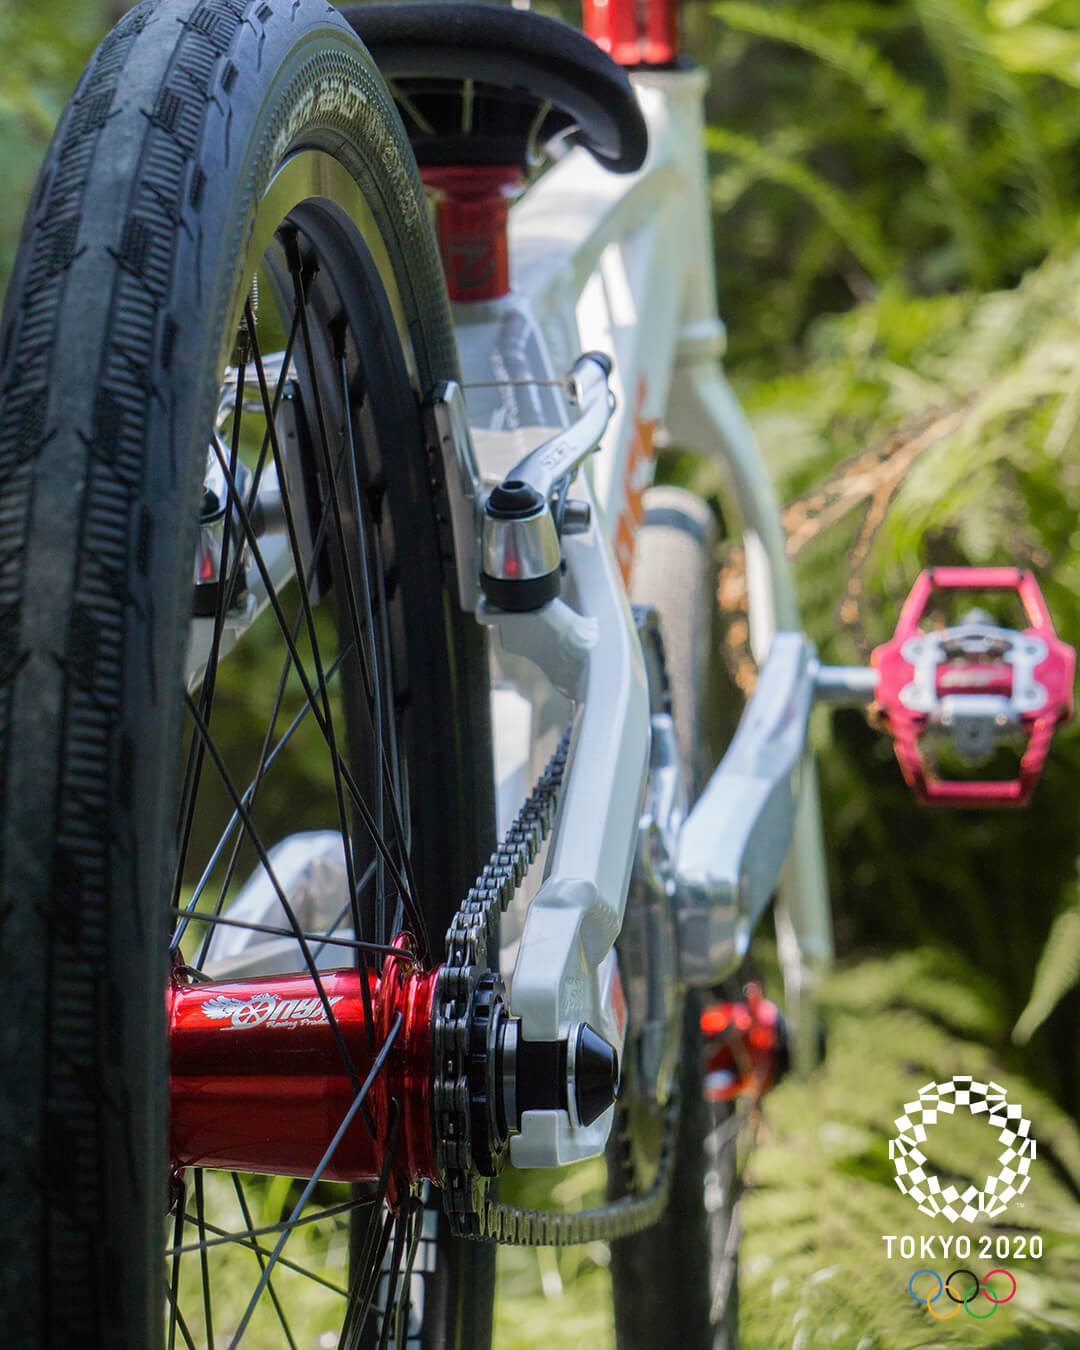 Drew Mechielsen Tokyo Olympic Bike Check 8 - Niels Bensink